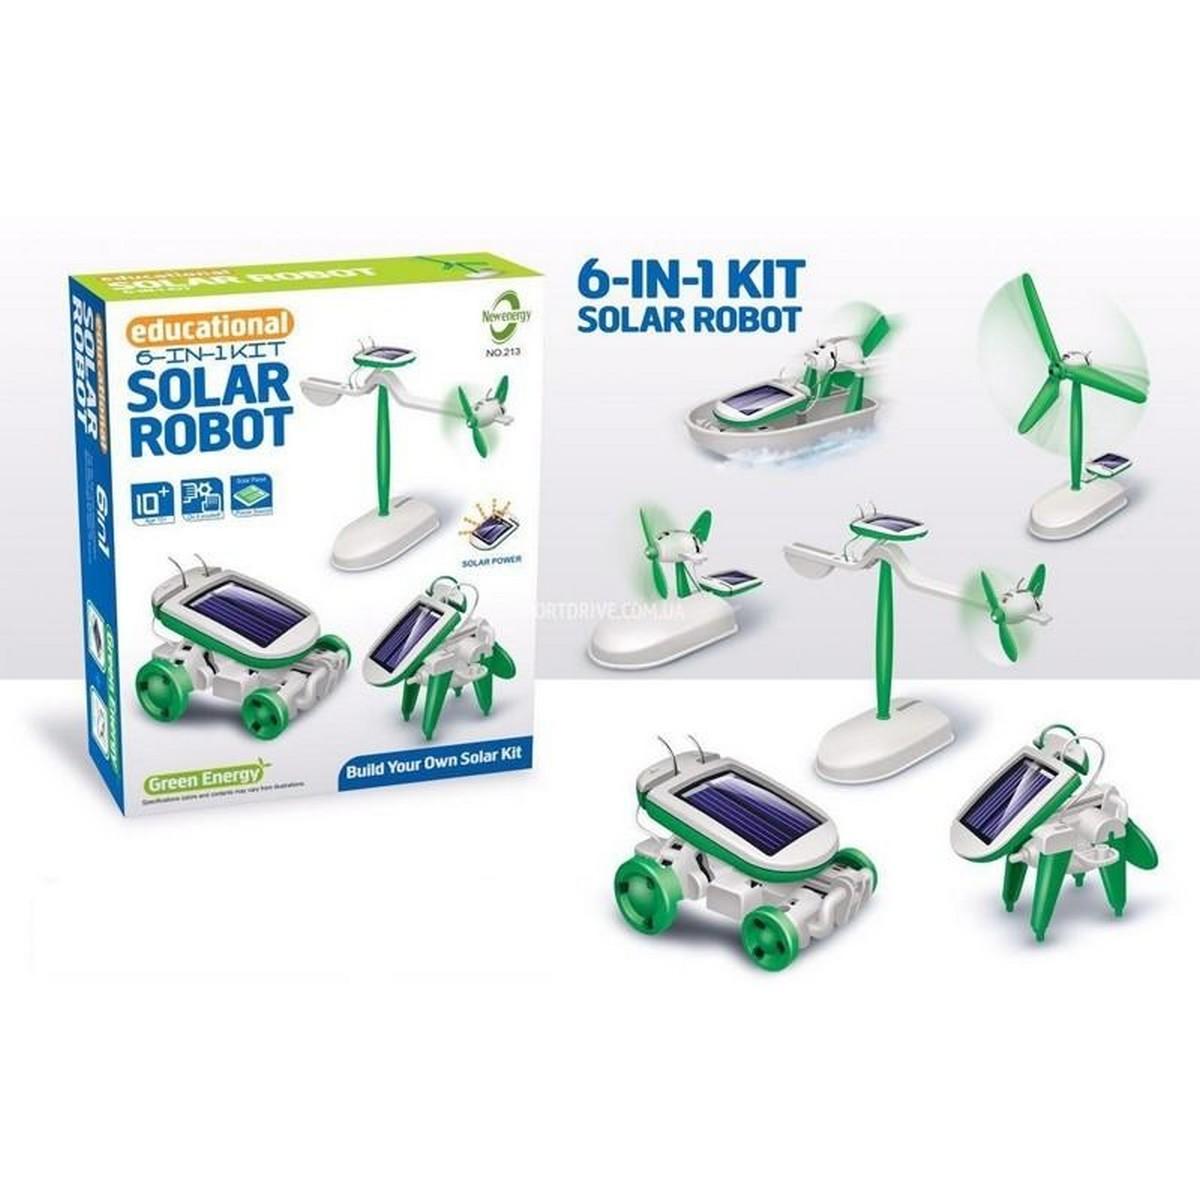 Educational 6 in 1 Solar Robot Kit (Solar Revolving Plane, Solar Windmill, Solar Plane, Solar Airboat, Solar Puppy, Solar Car)